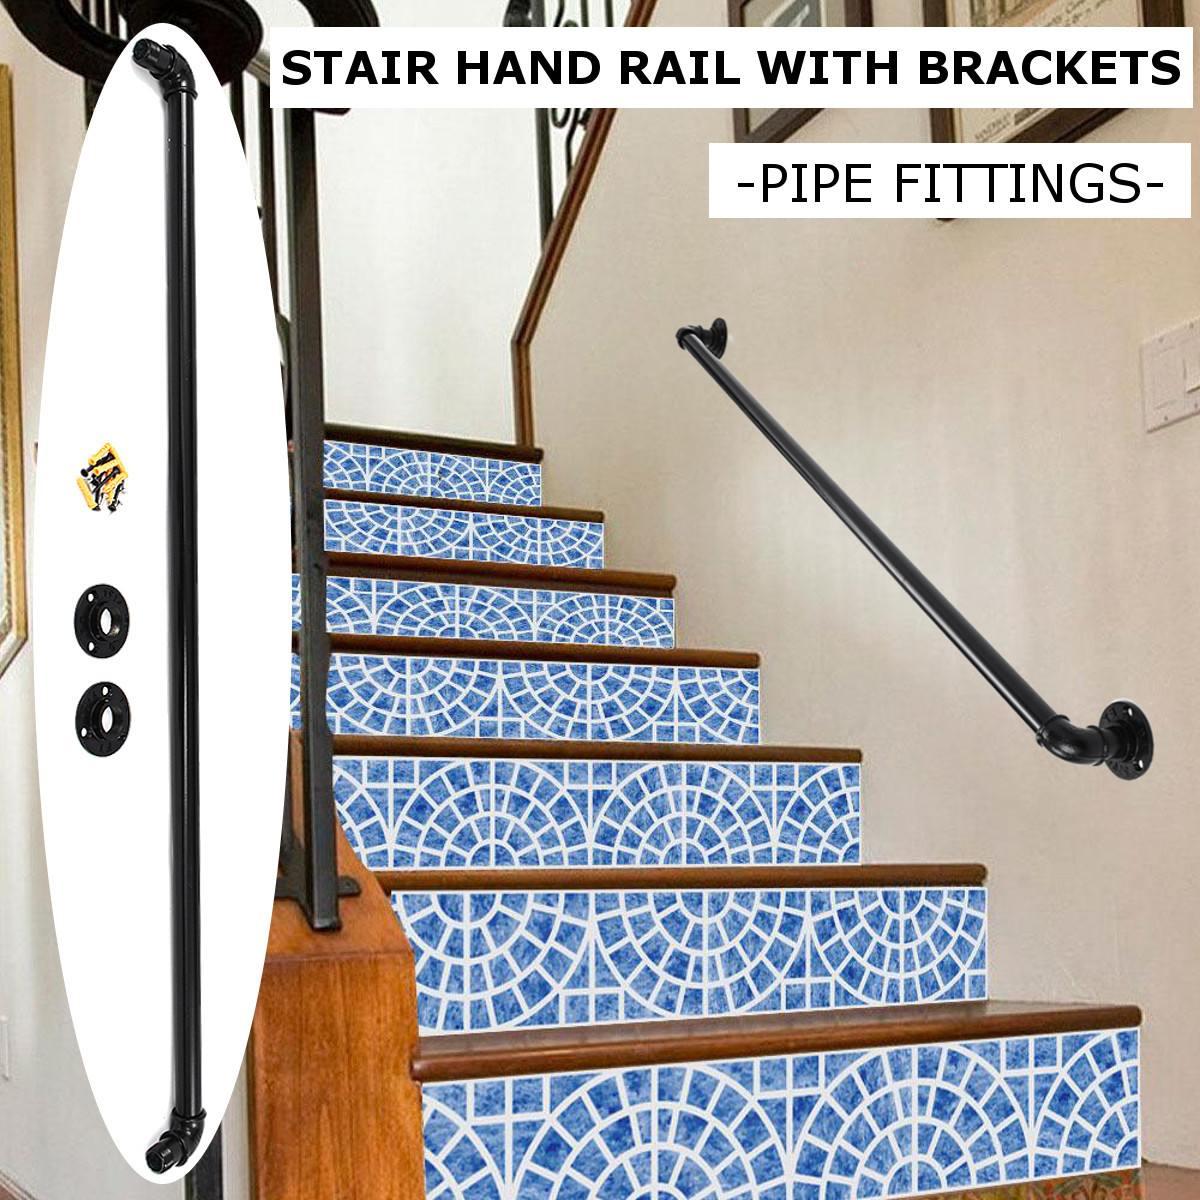 1M Industrial Retro Bookshelf Black Wall Ceiling Mounted Open | Black Iron Pipe Handrail | Cast Iron | Horizontal Pipe | Paint Pipe | Stair Outdoor Decatur | Railing Aluminium Pipe